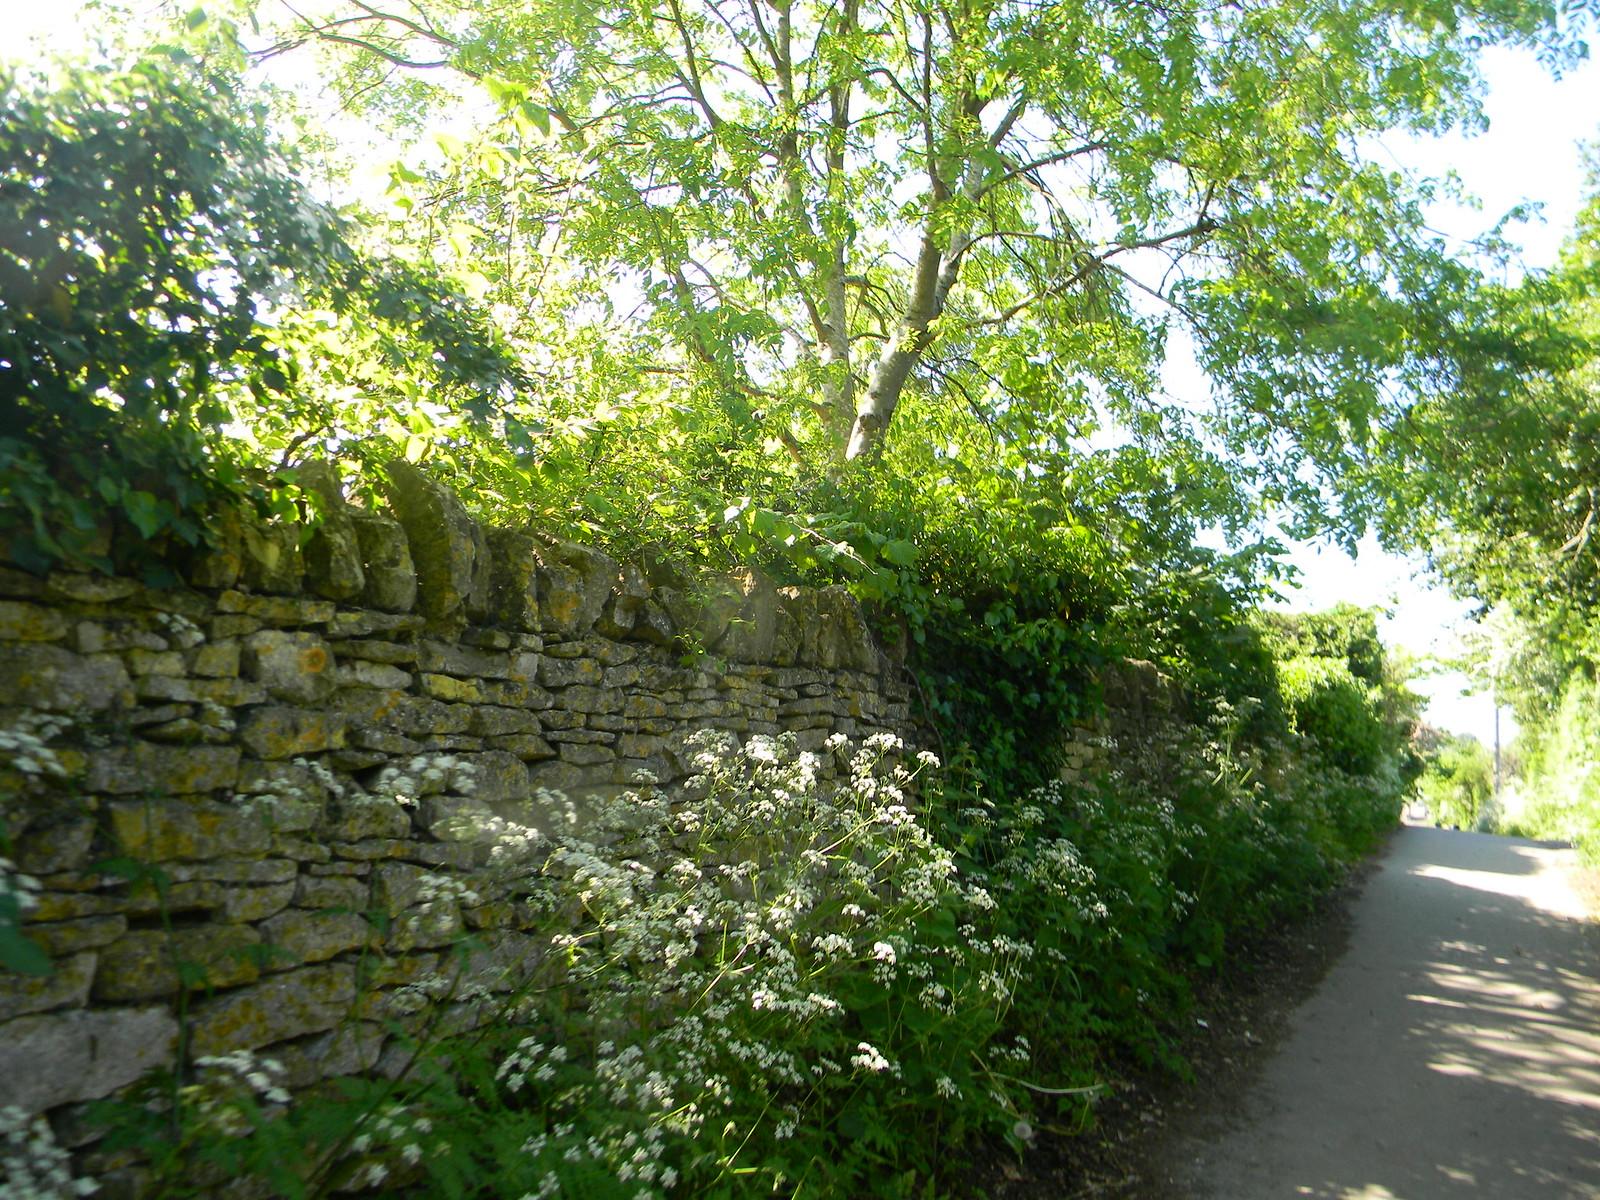 Leafy wall Moreton-in-Marsh Circular